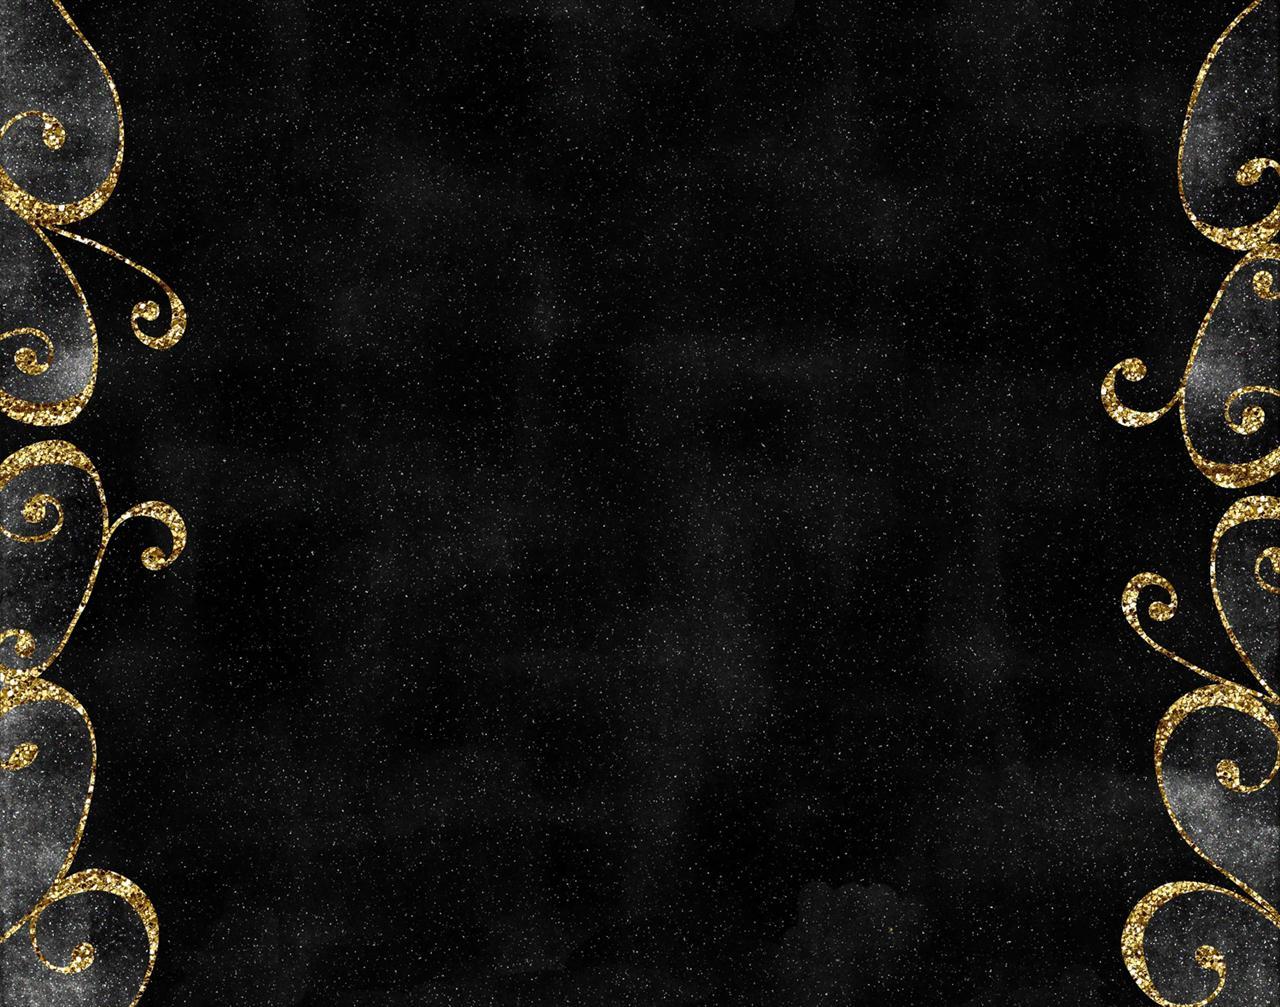 Black And Gold Wallpaper Border 26 Free